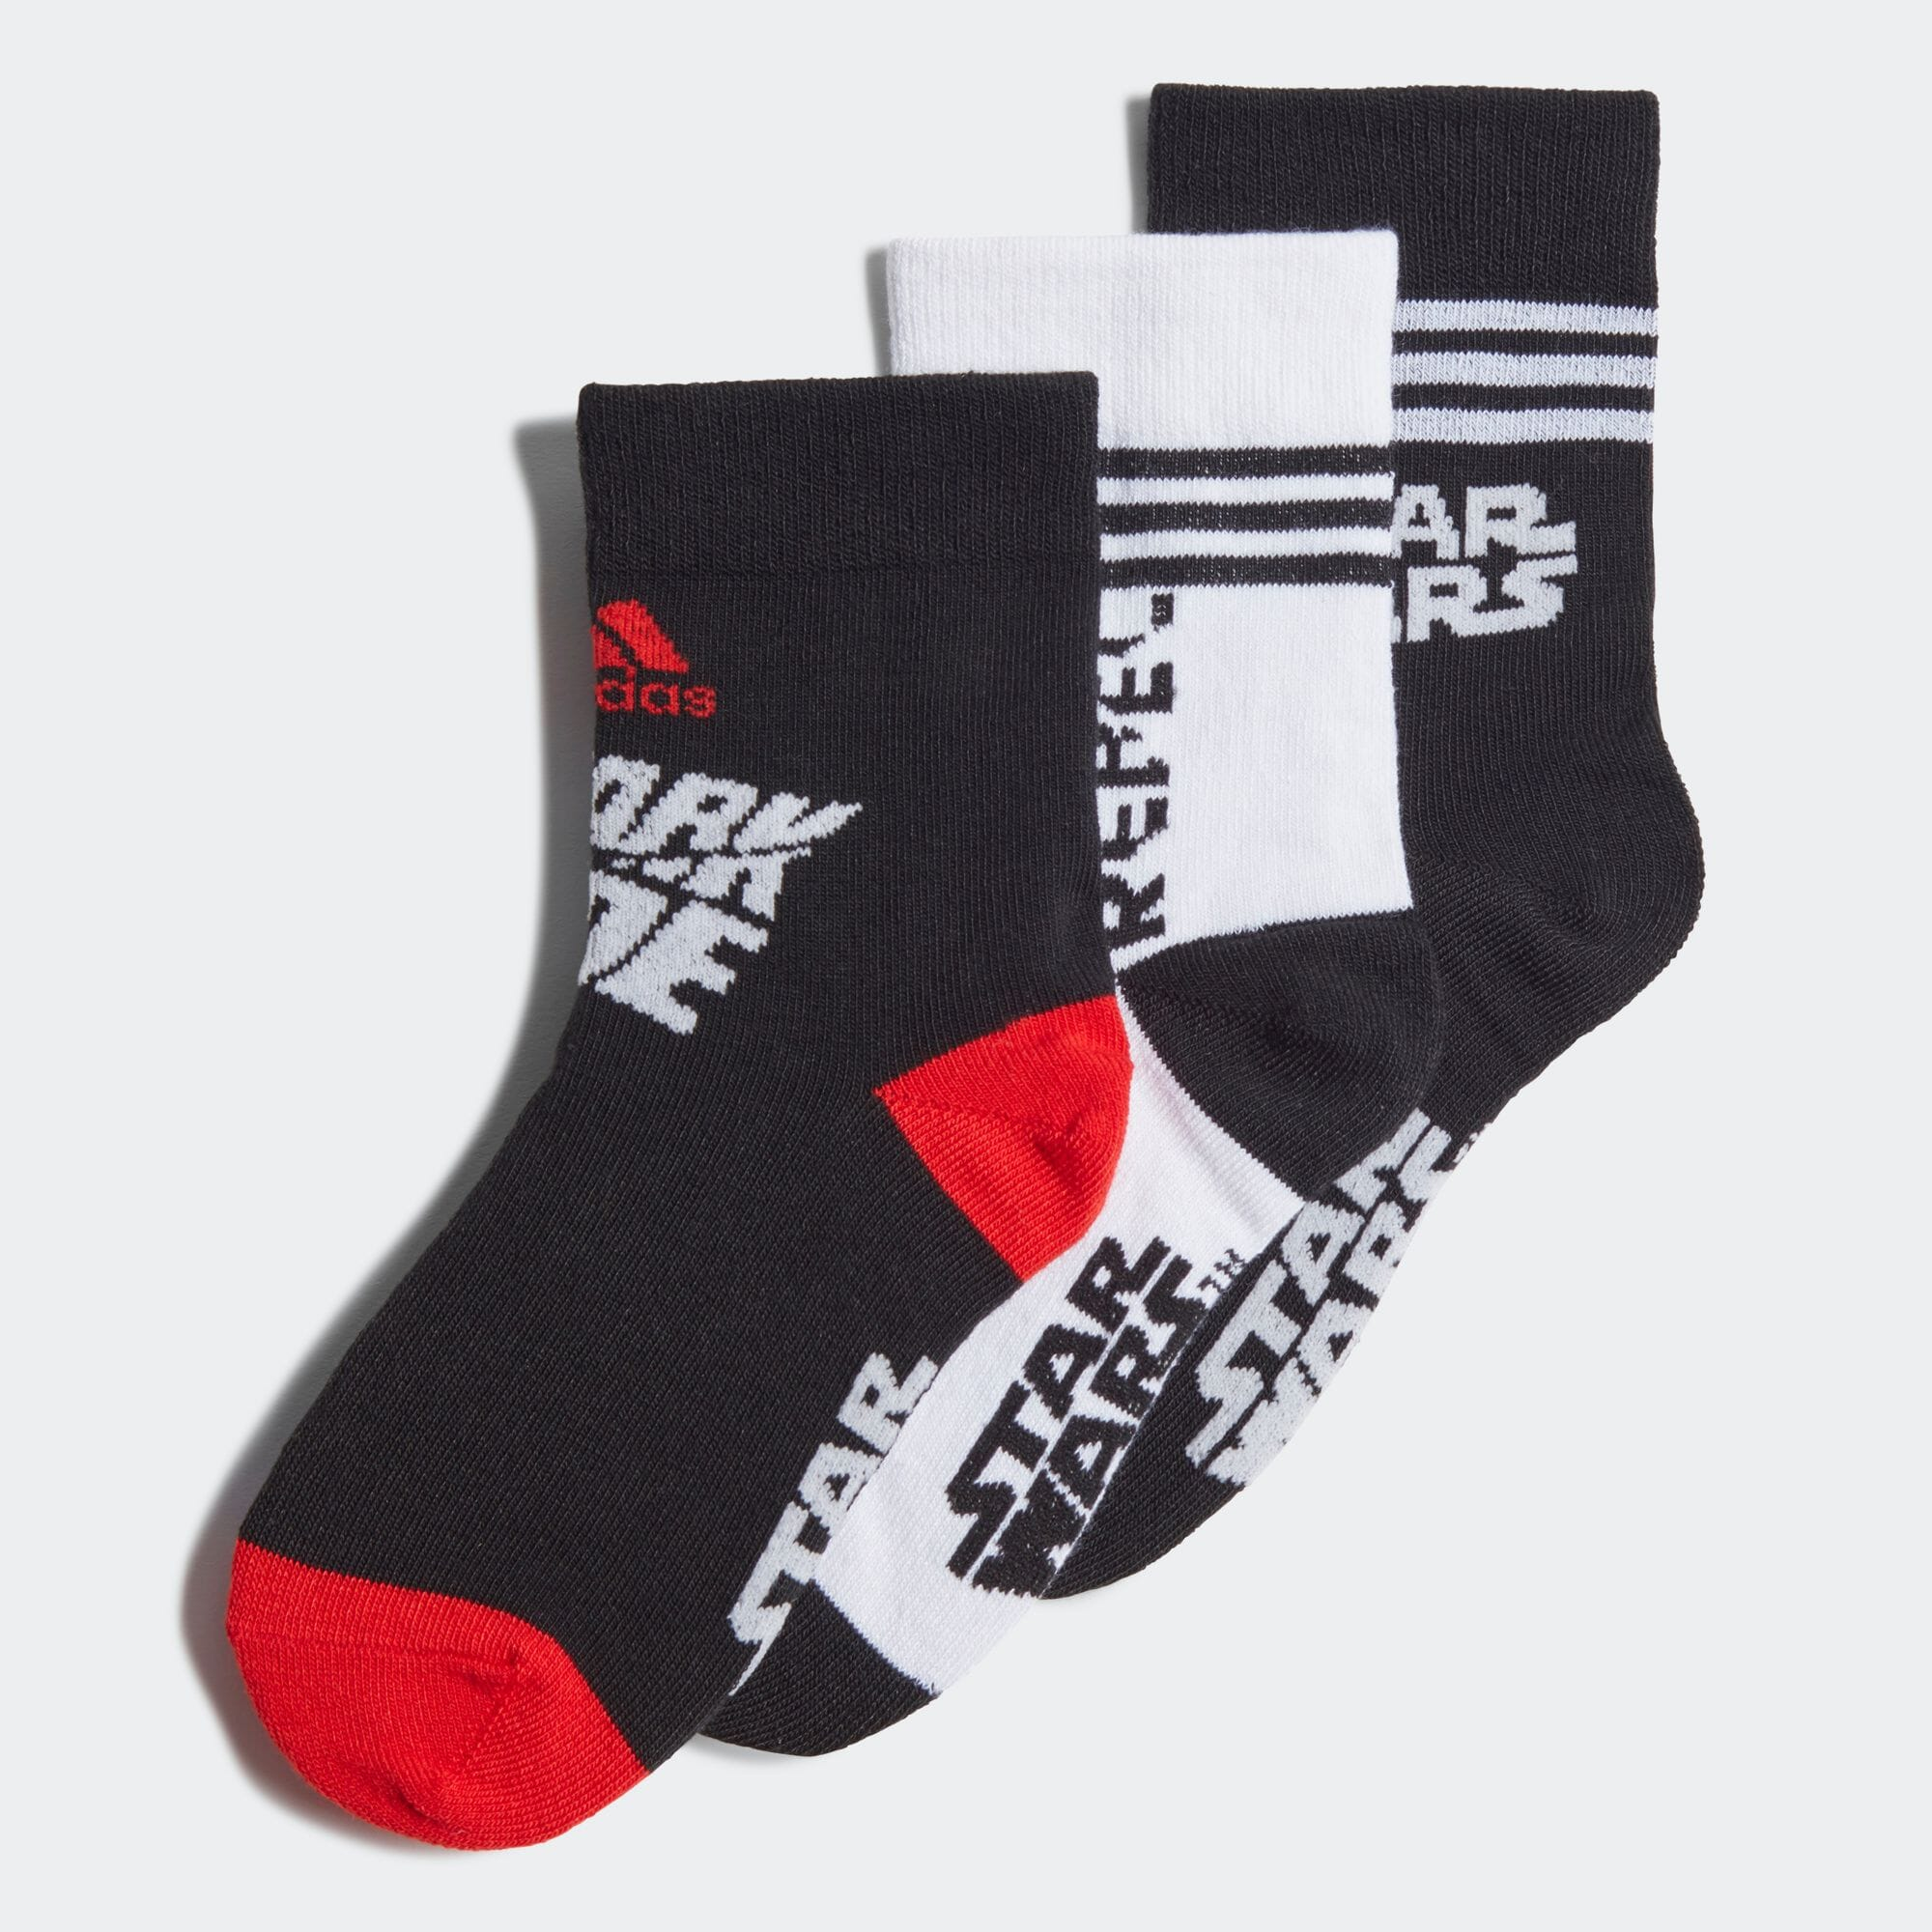 Star Wars クルーソックス3足組 / Star Wars Crew Socks 3 Pairs